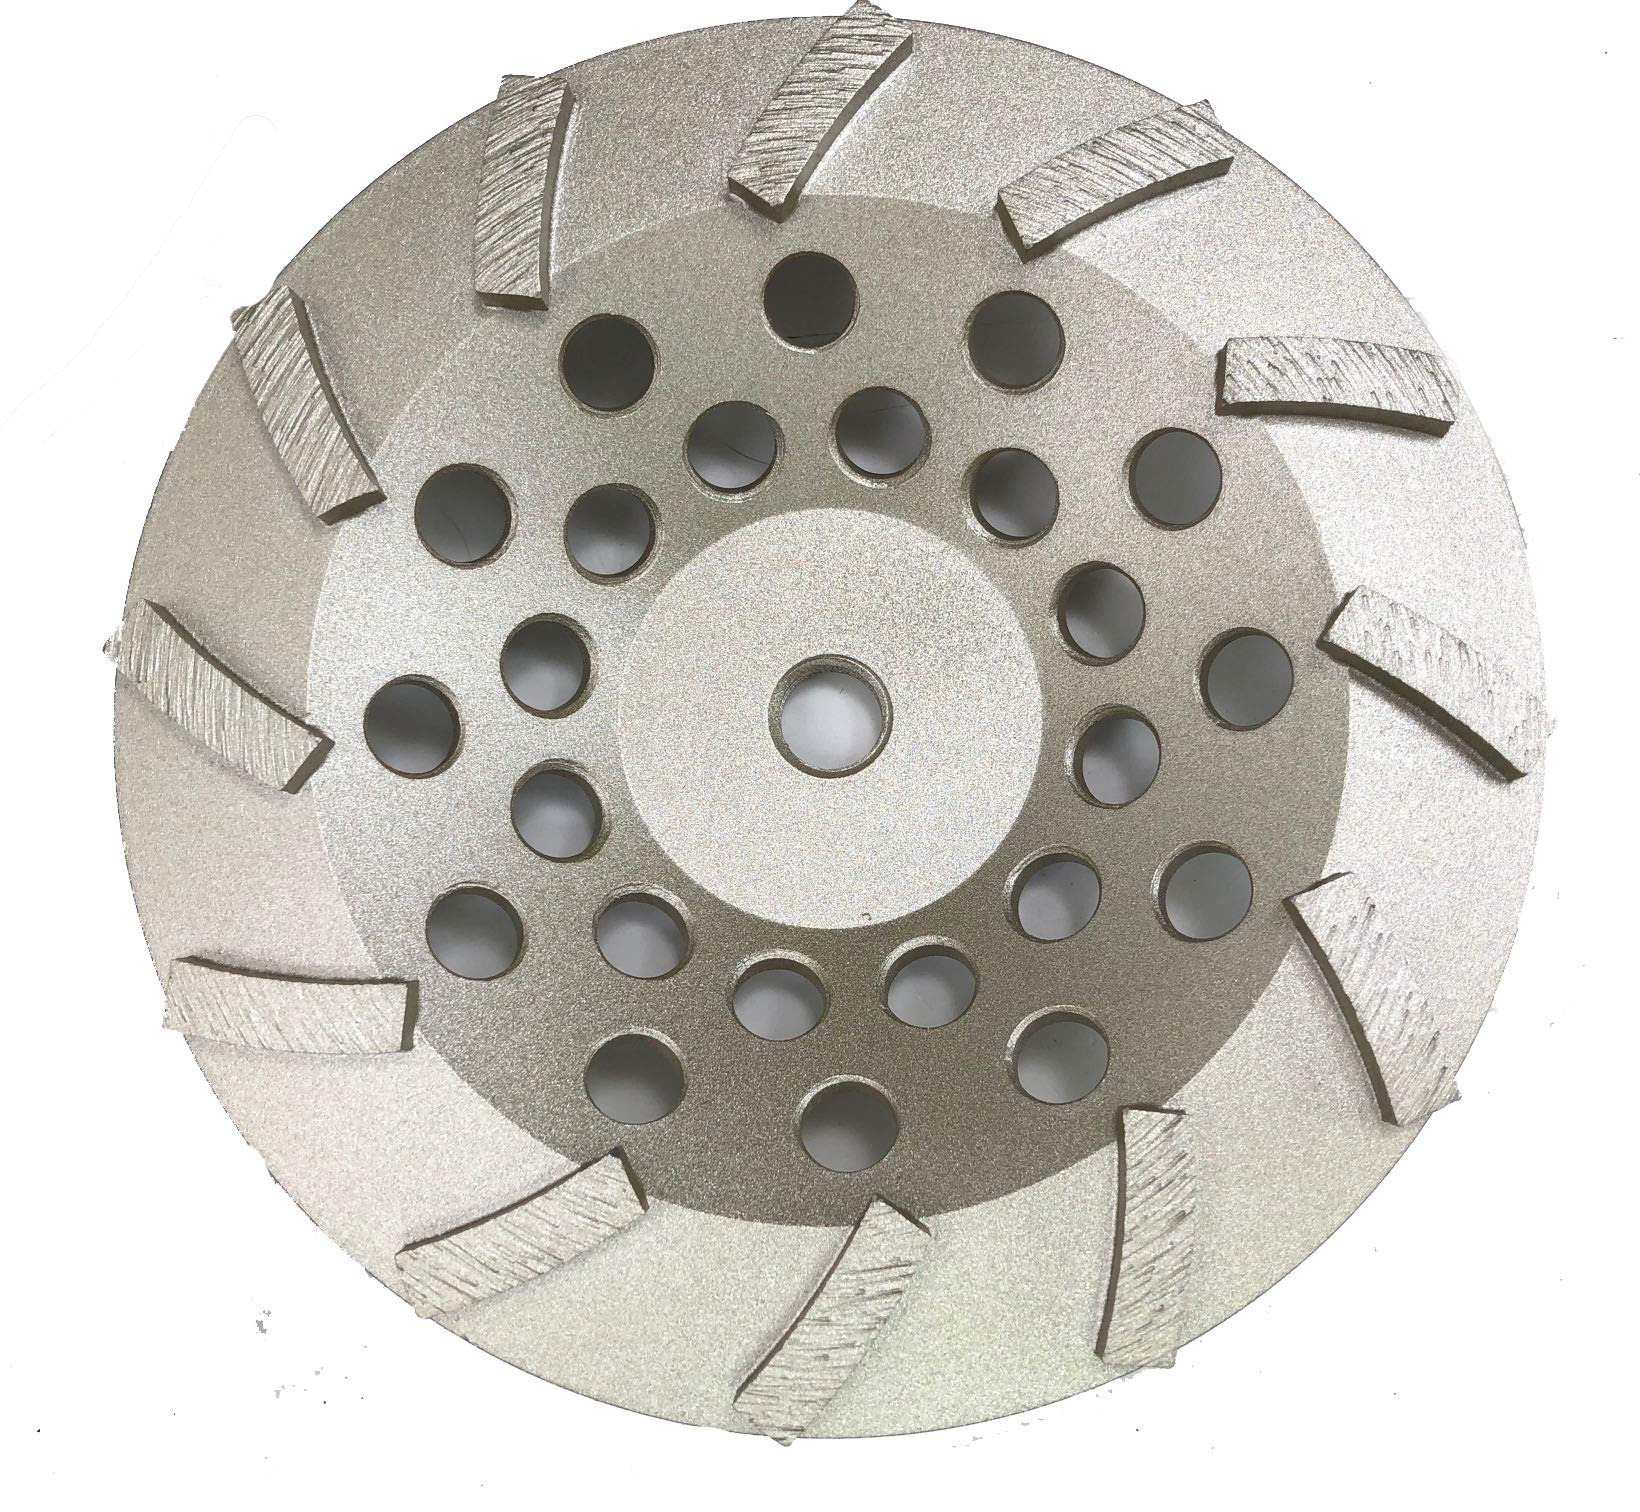 Diamond Cup Wheels Turbo Fast Grinding Threaded for Concrete (7'', 12 Seg)